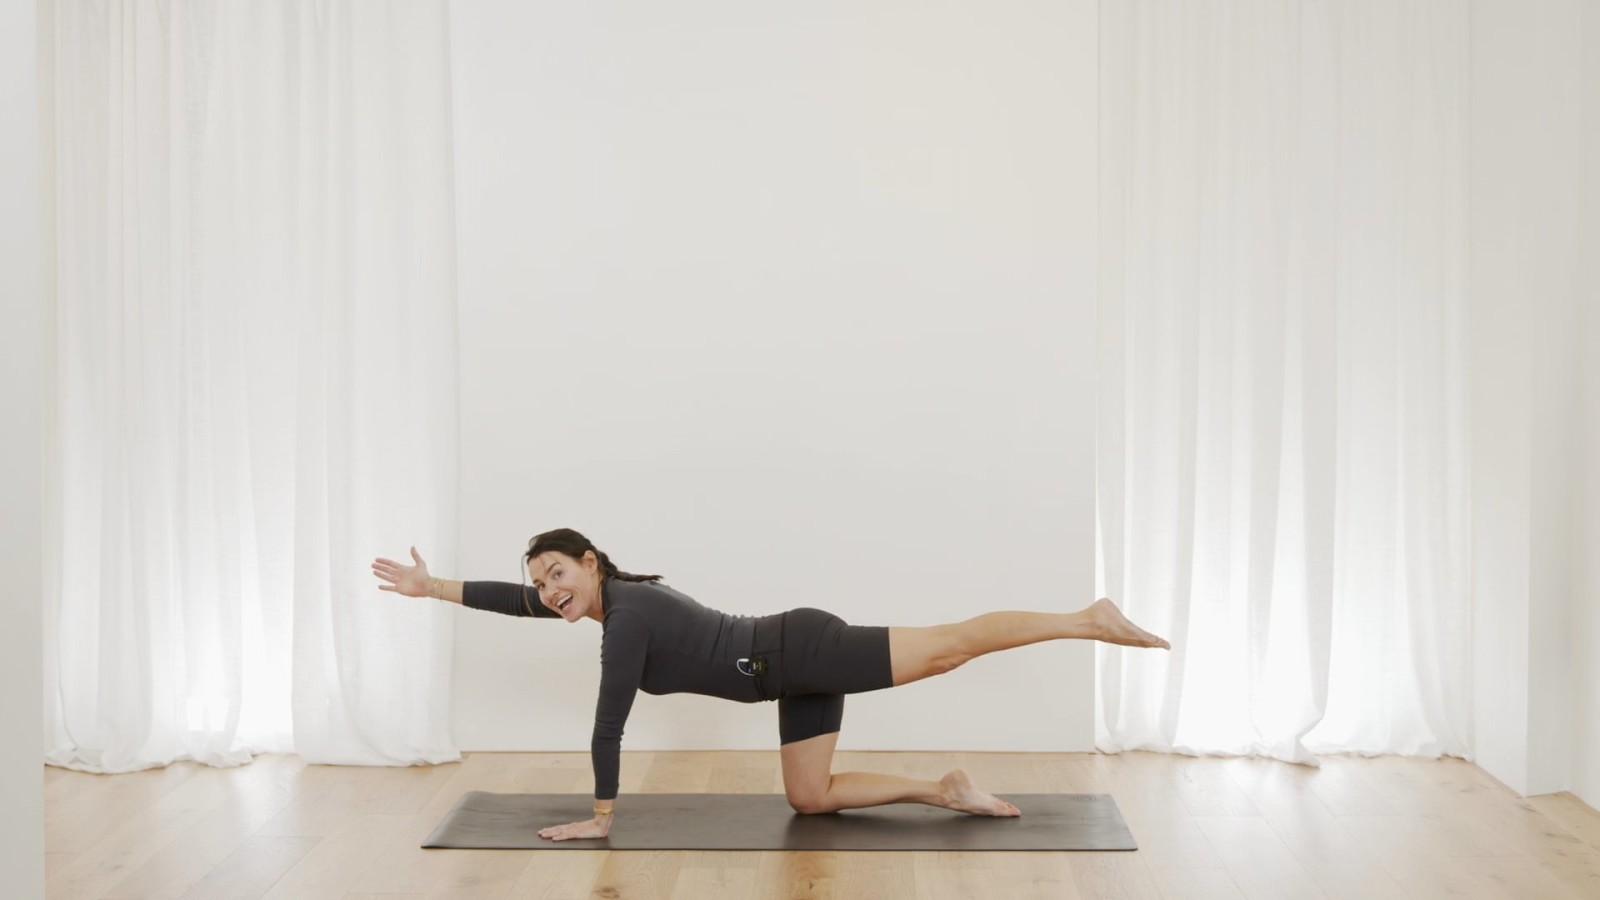 Intermediate Mat Pilates workout with Aneta Bachanova